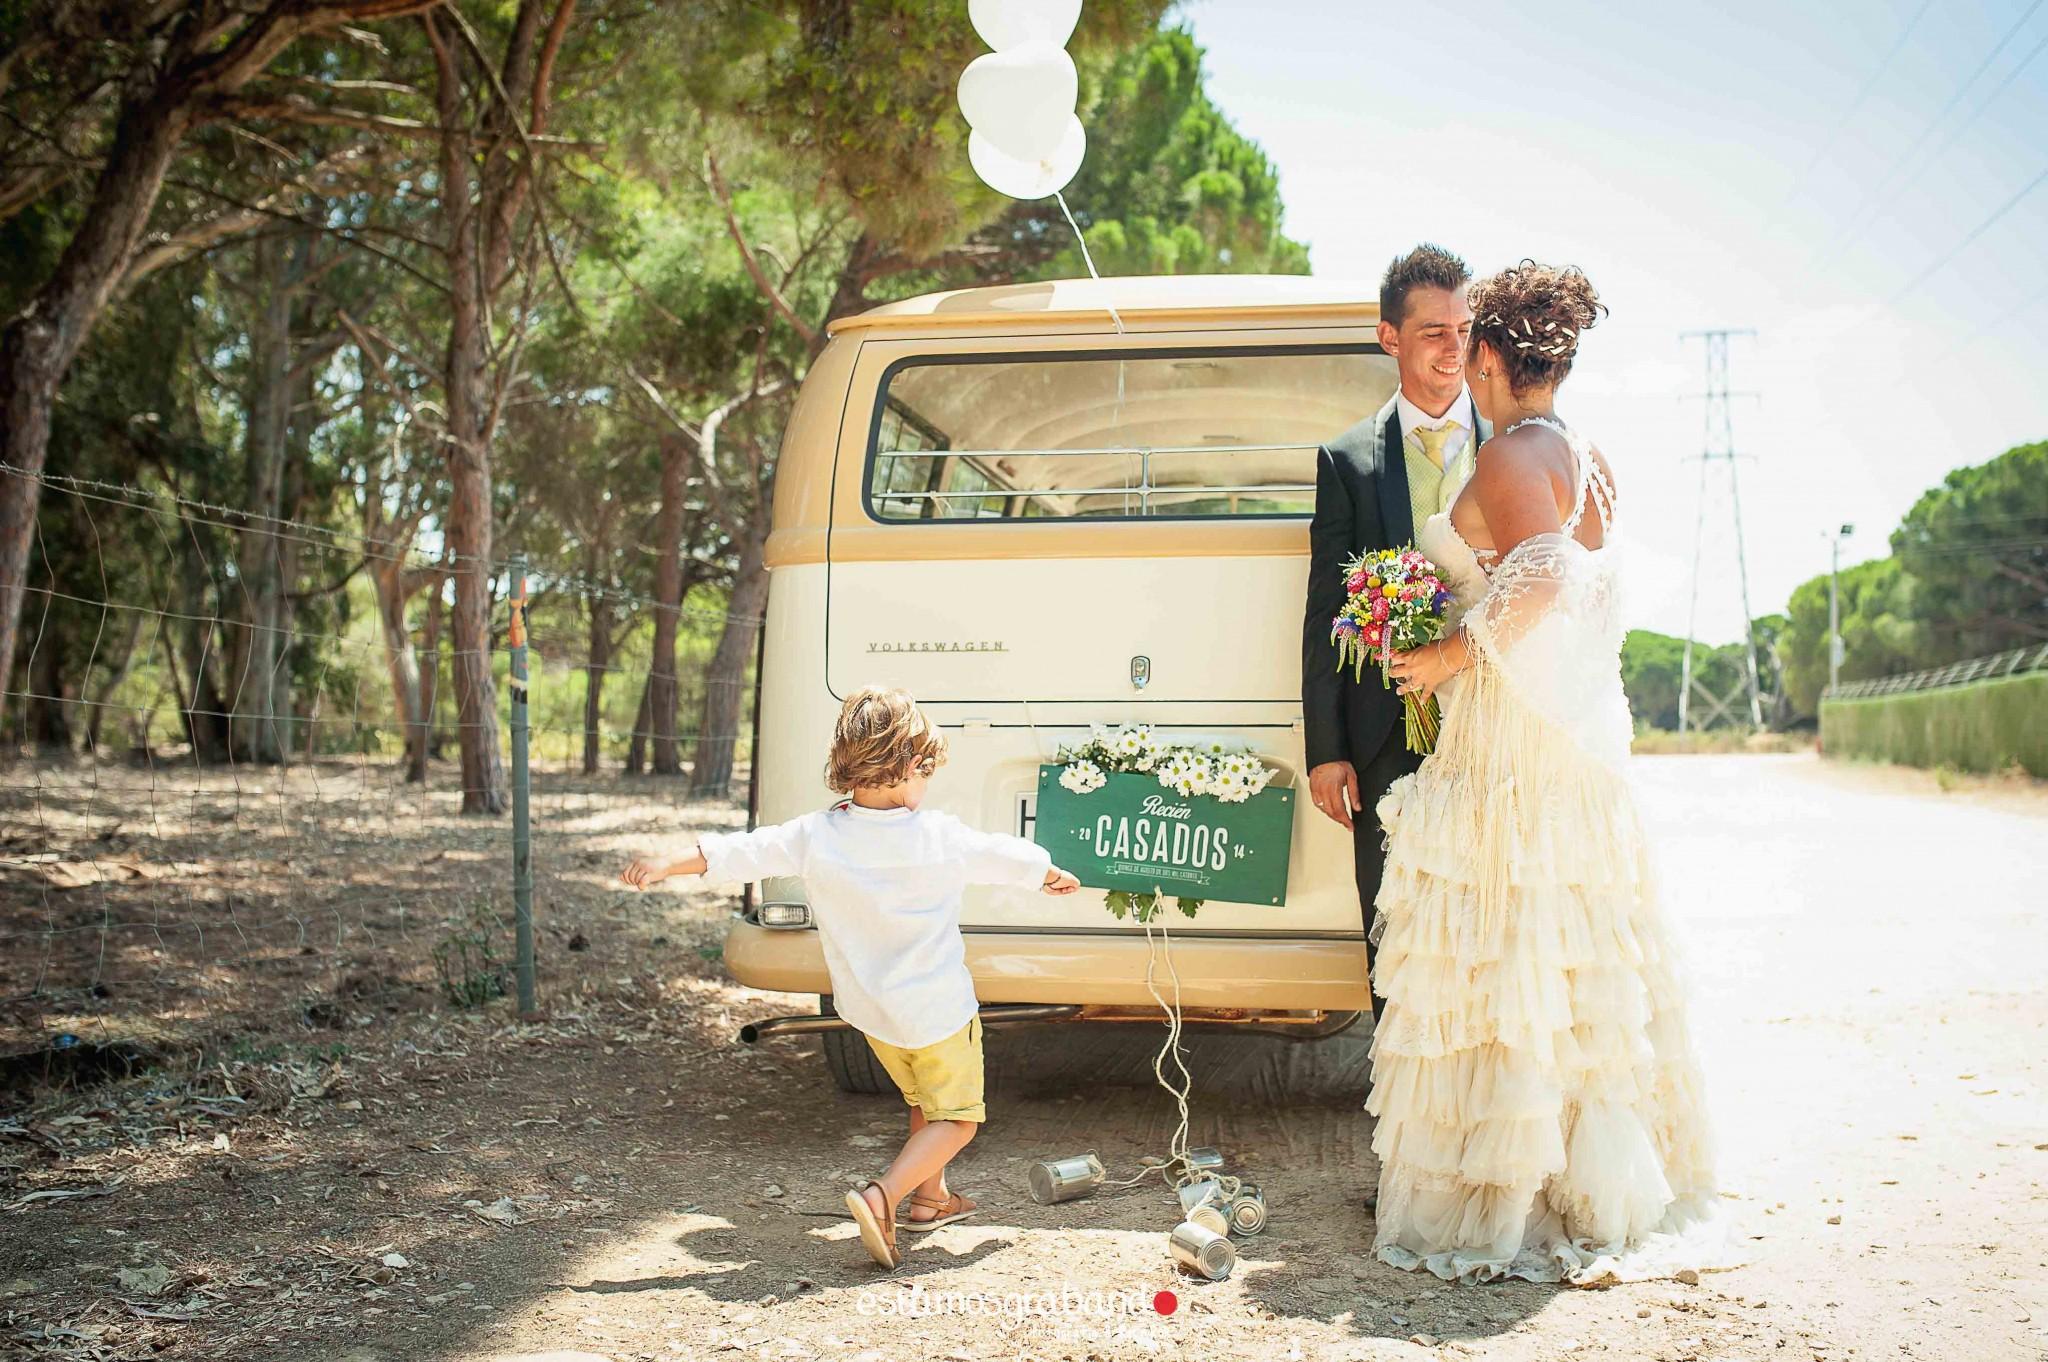 pili-y-jose_fotograficc81a-cadiz-66 Pili & Jose - video boda cadiz